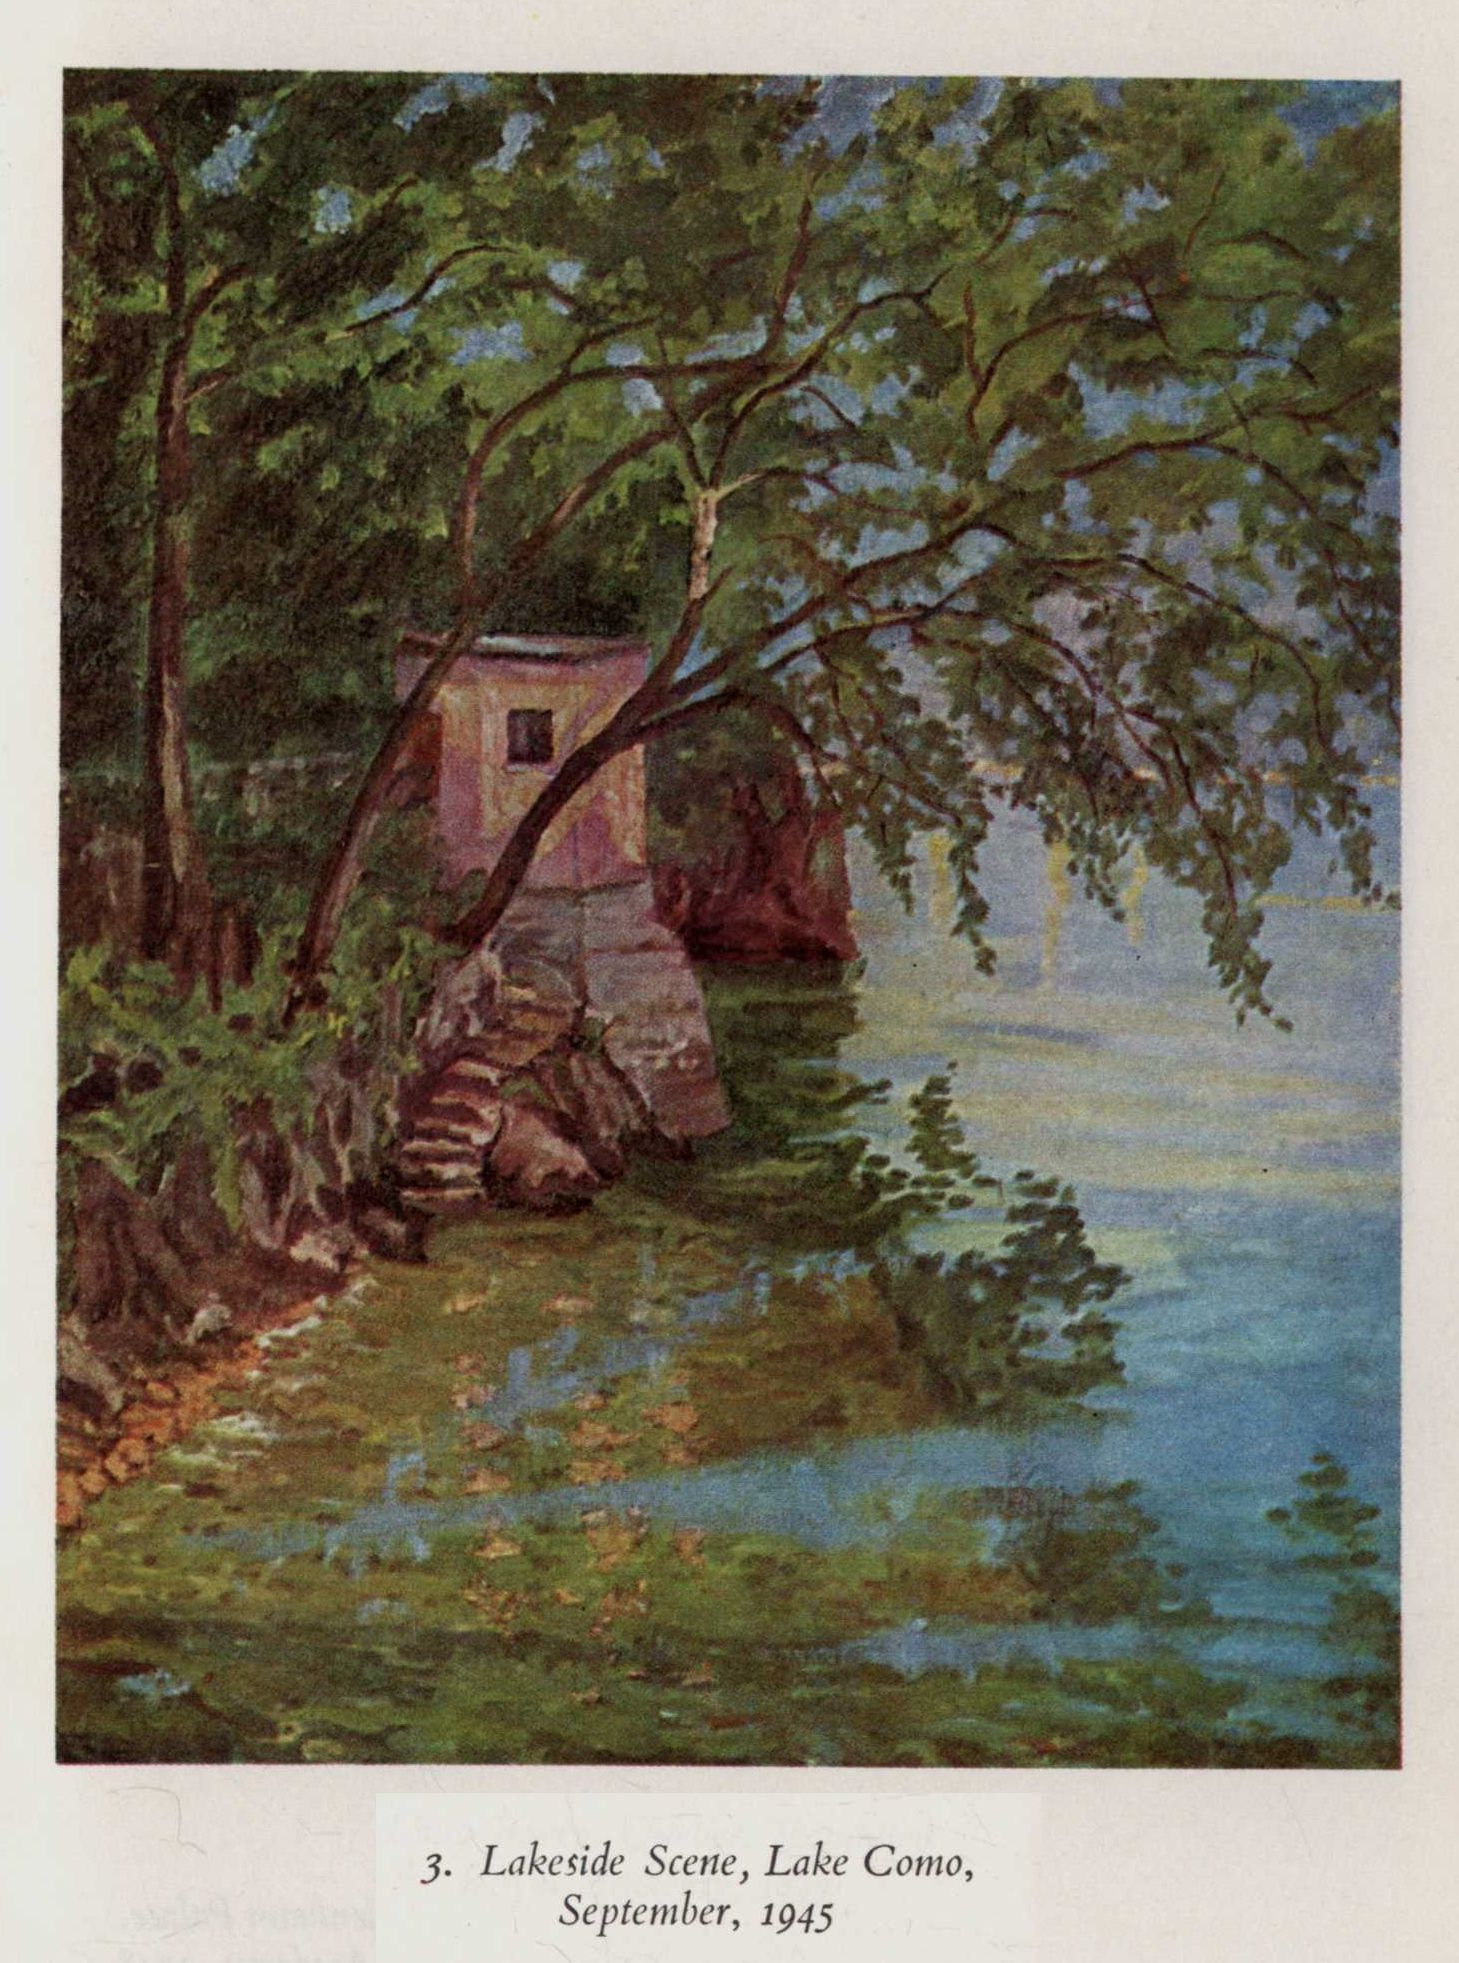 Lakeside Scene, Lakeo